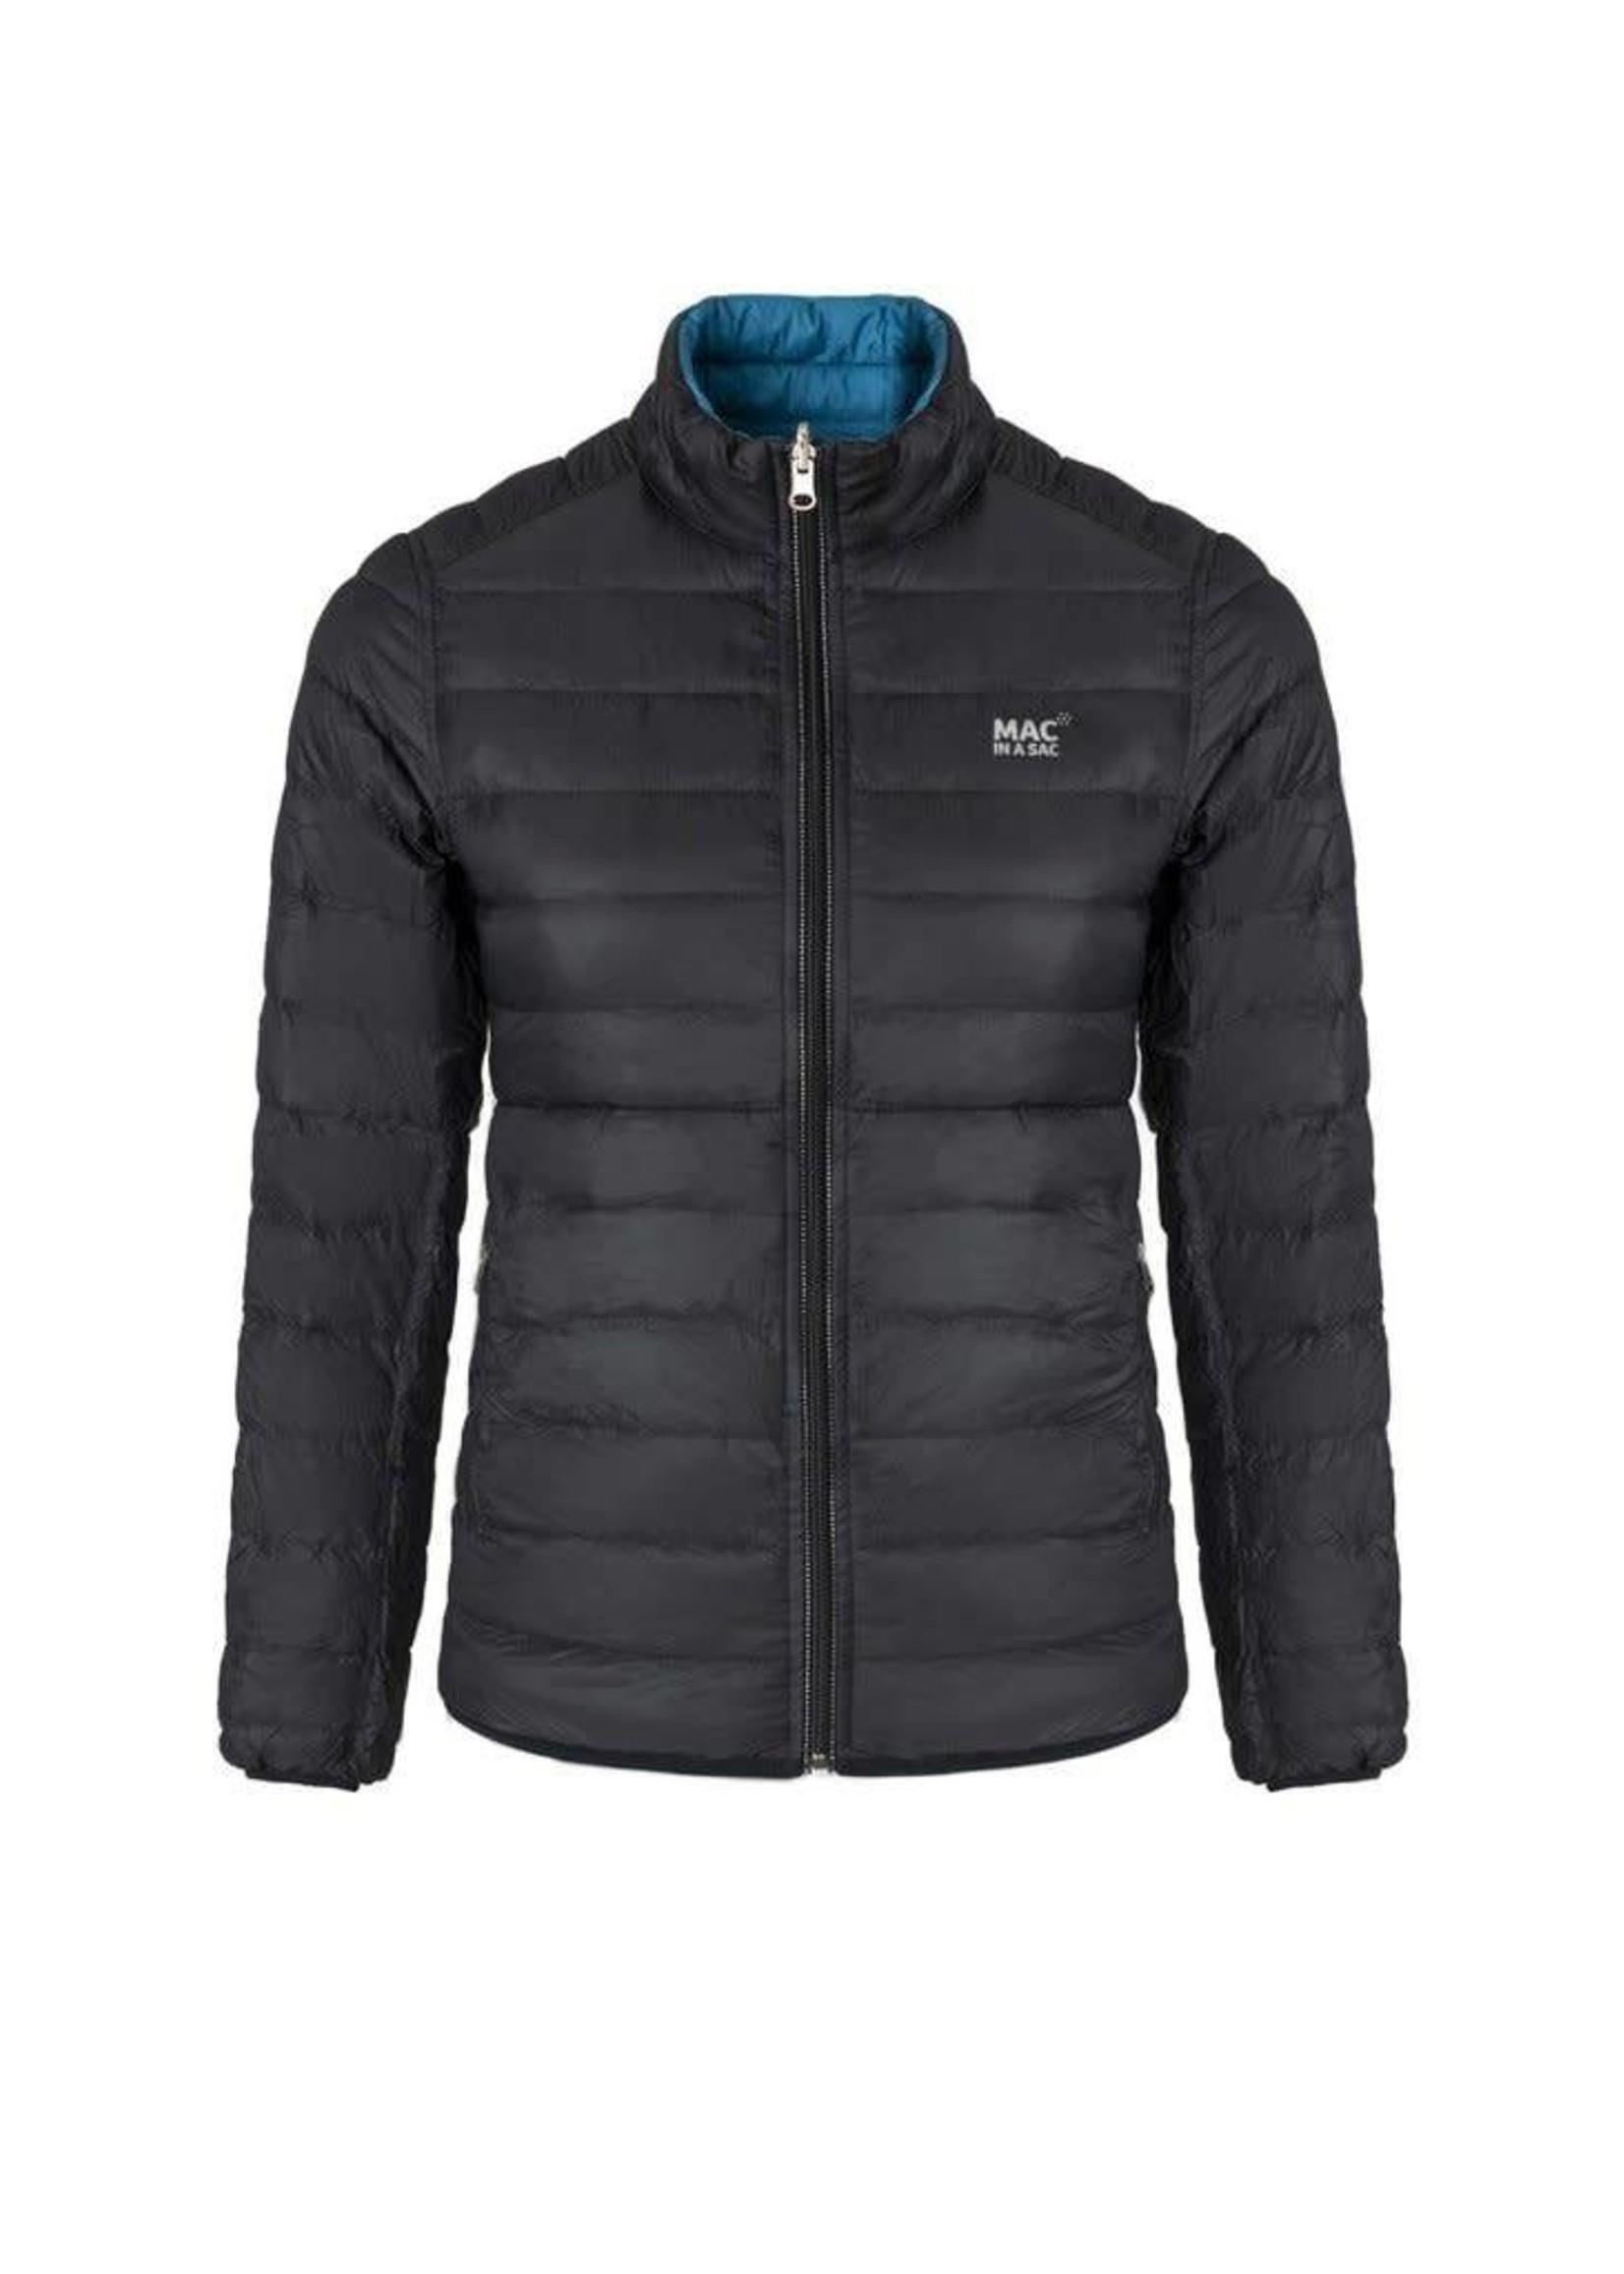 Mac In A Sac Mac In A Sac Polar Rev Down Ladies Jacket (2021)